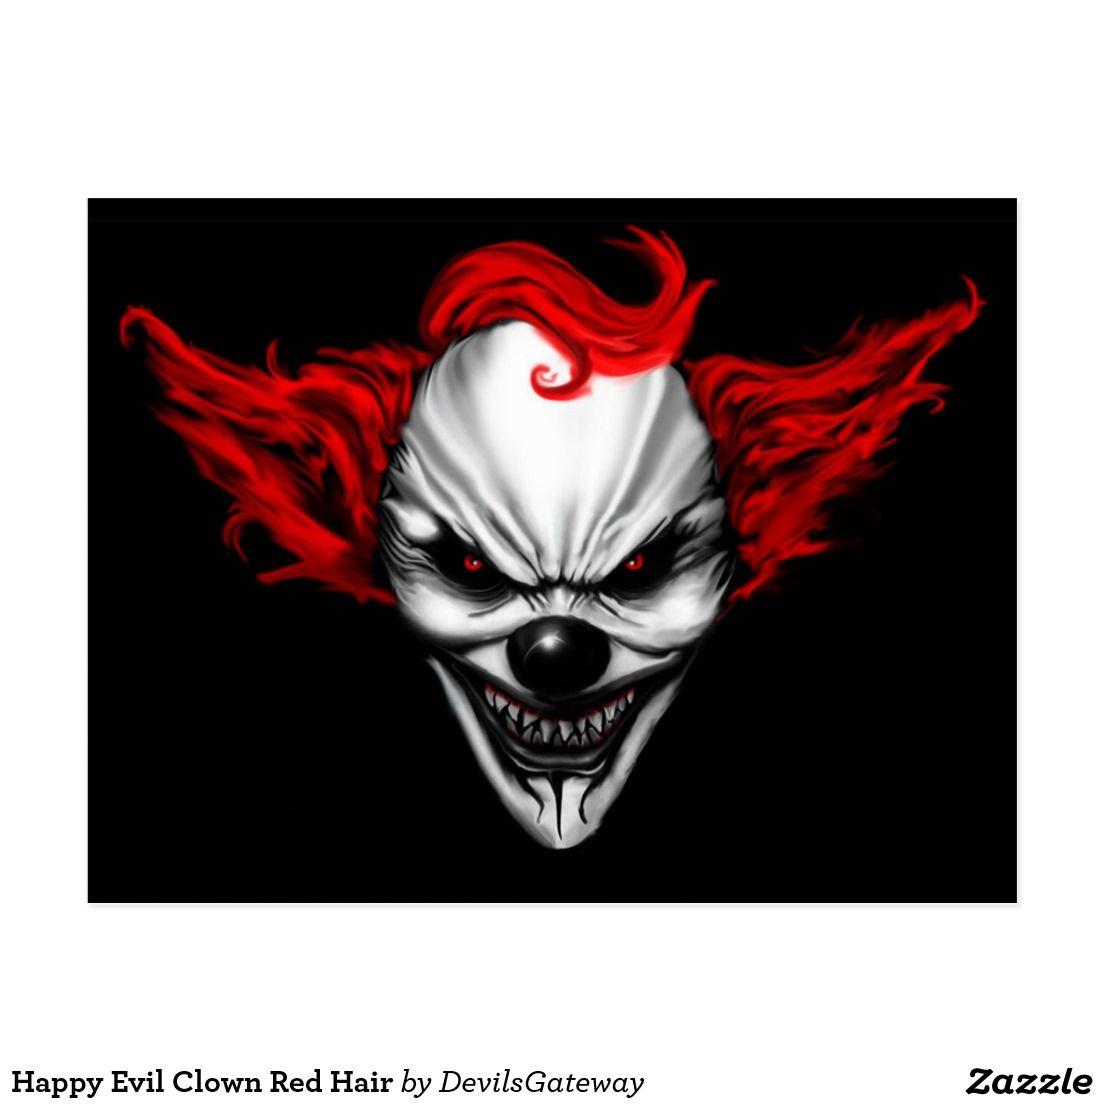 Tee Hunt Scary Circus Clown Muscle Shirt Insane Creepy Clown Evil MAD Horror